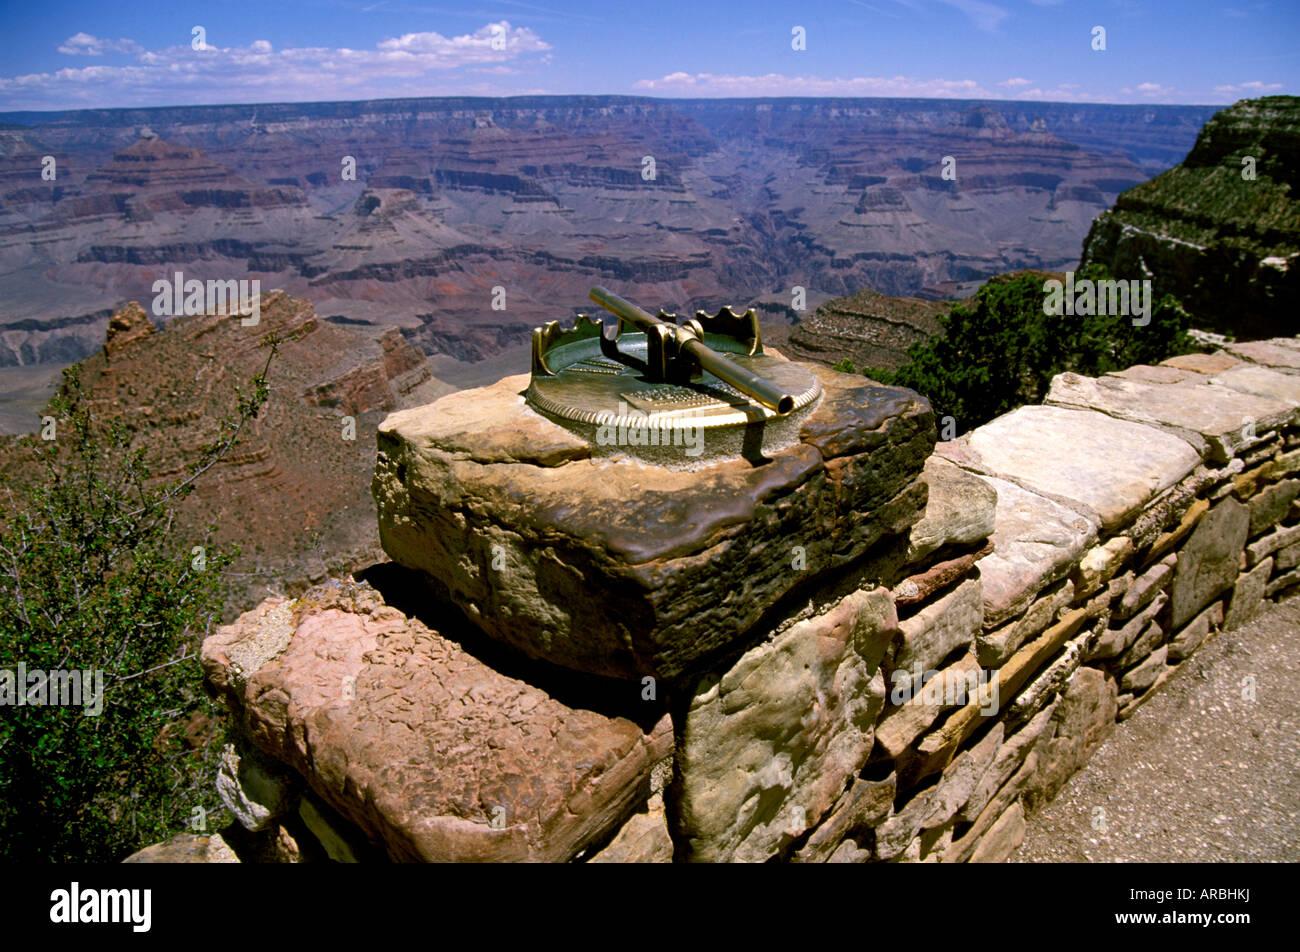 AZ Grand Canyon National Park Arizona sighting instrument at the South Rim erosion cliffs geology rocks arid Colorado - Stock Image